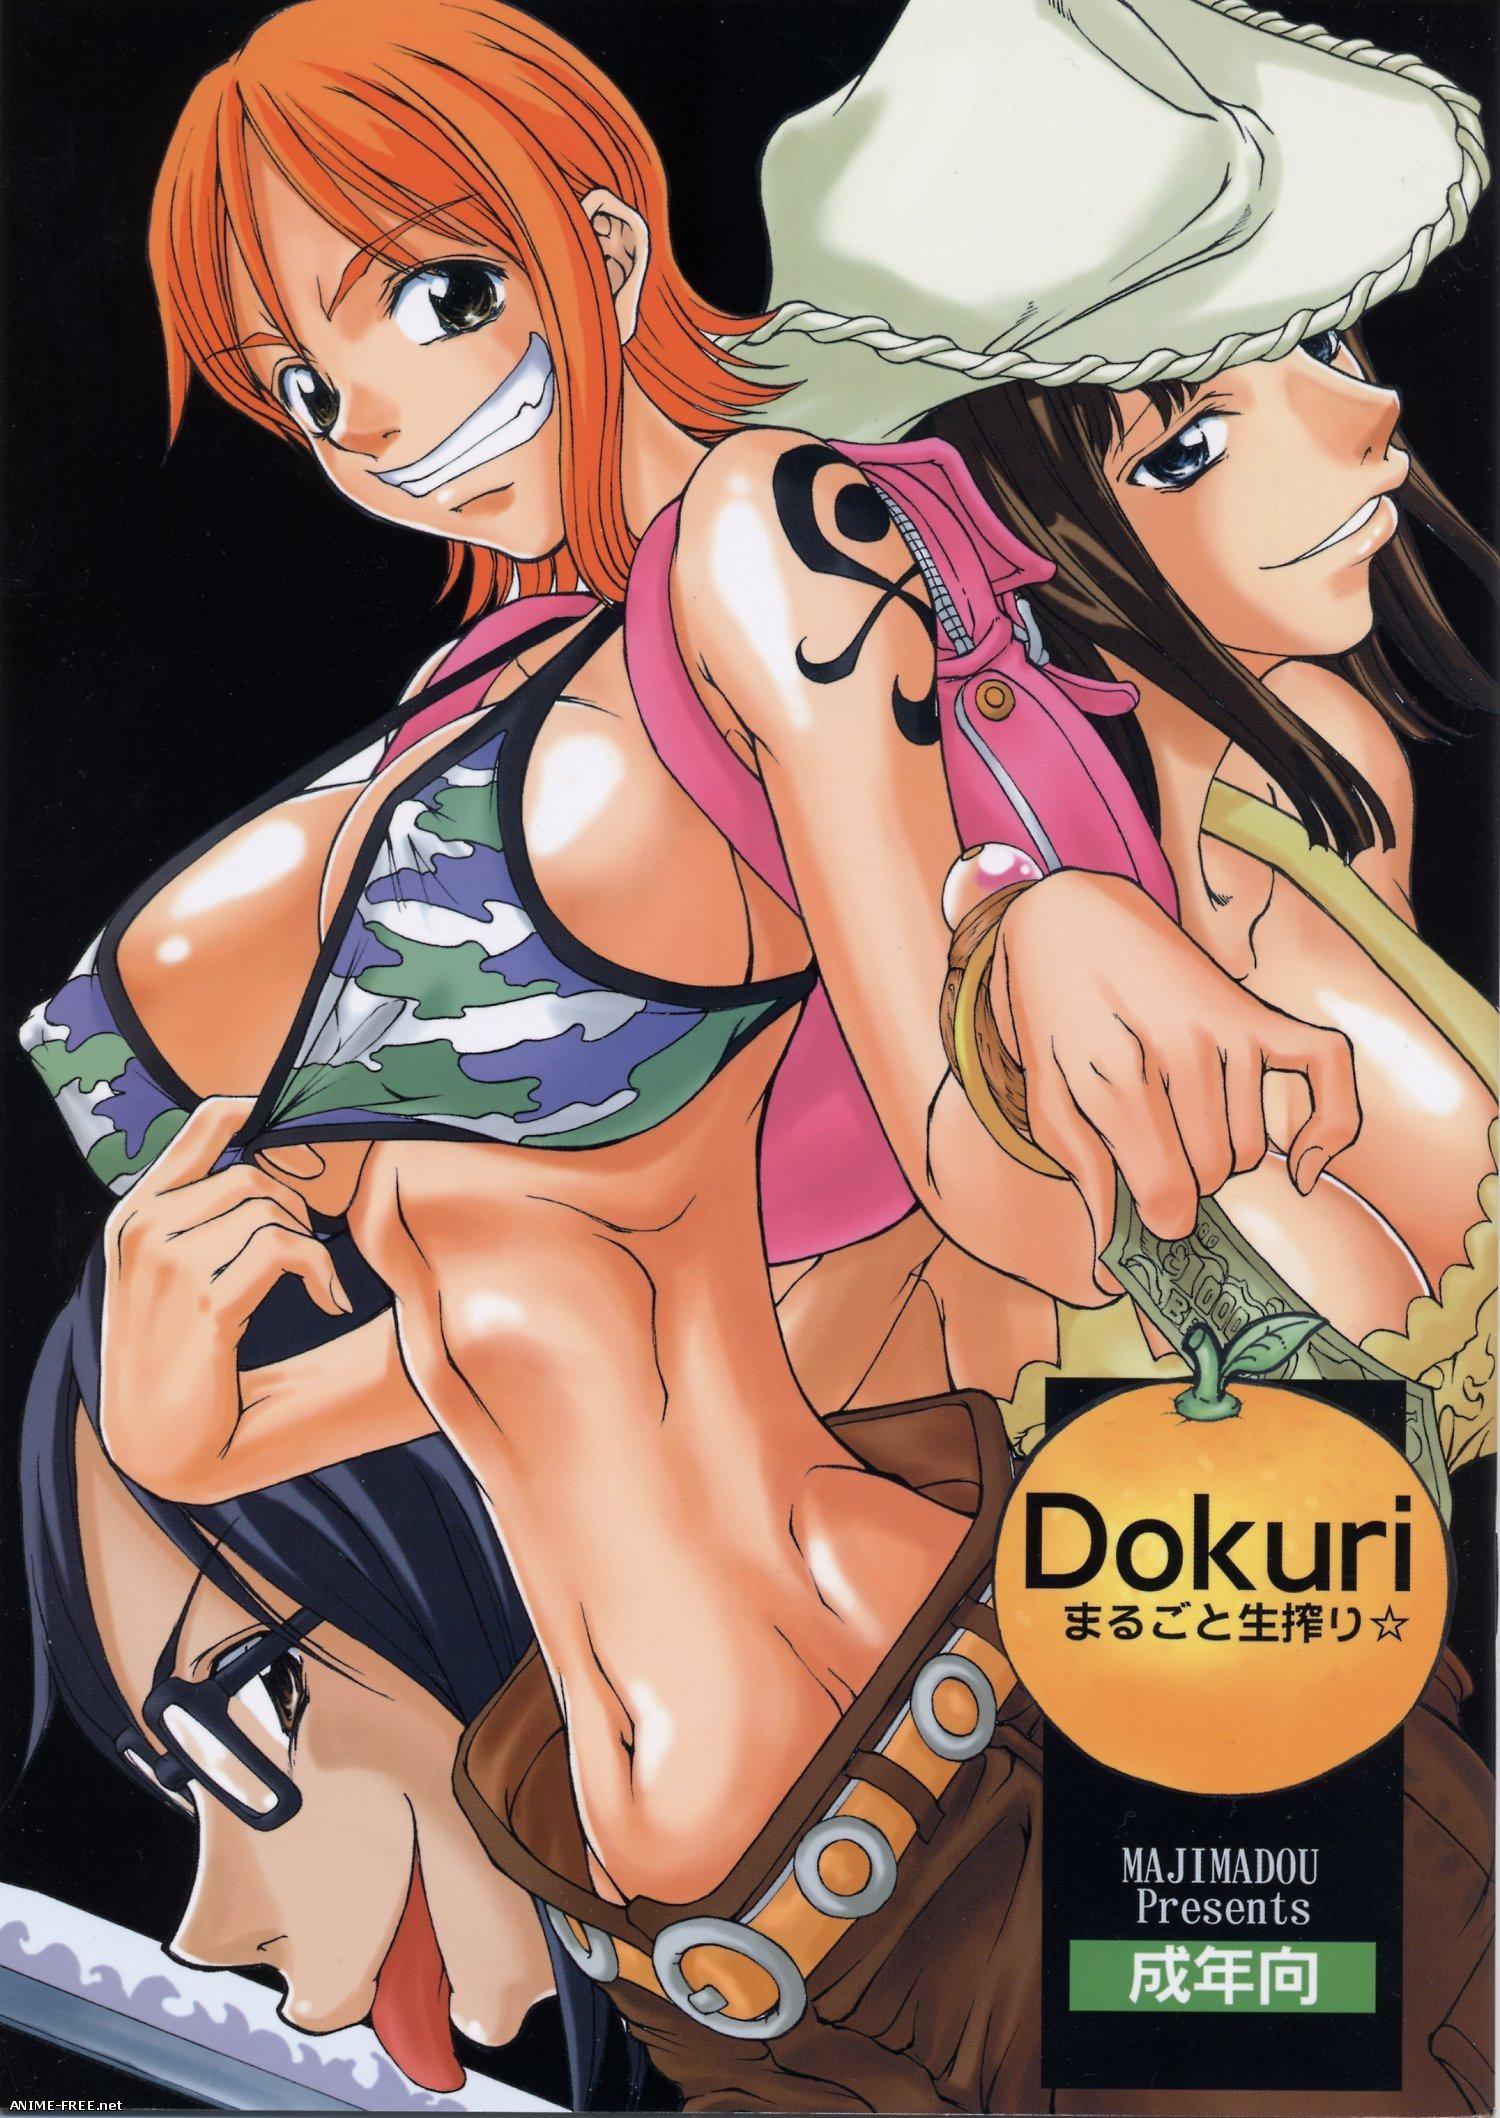 Matou / cir. Majimadou - Сборник хентай манги [Ptcen] [JAP,ENG,RUS] Manga Hentai